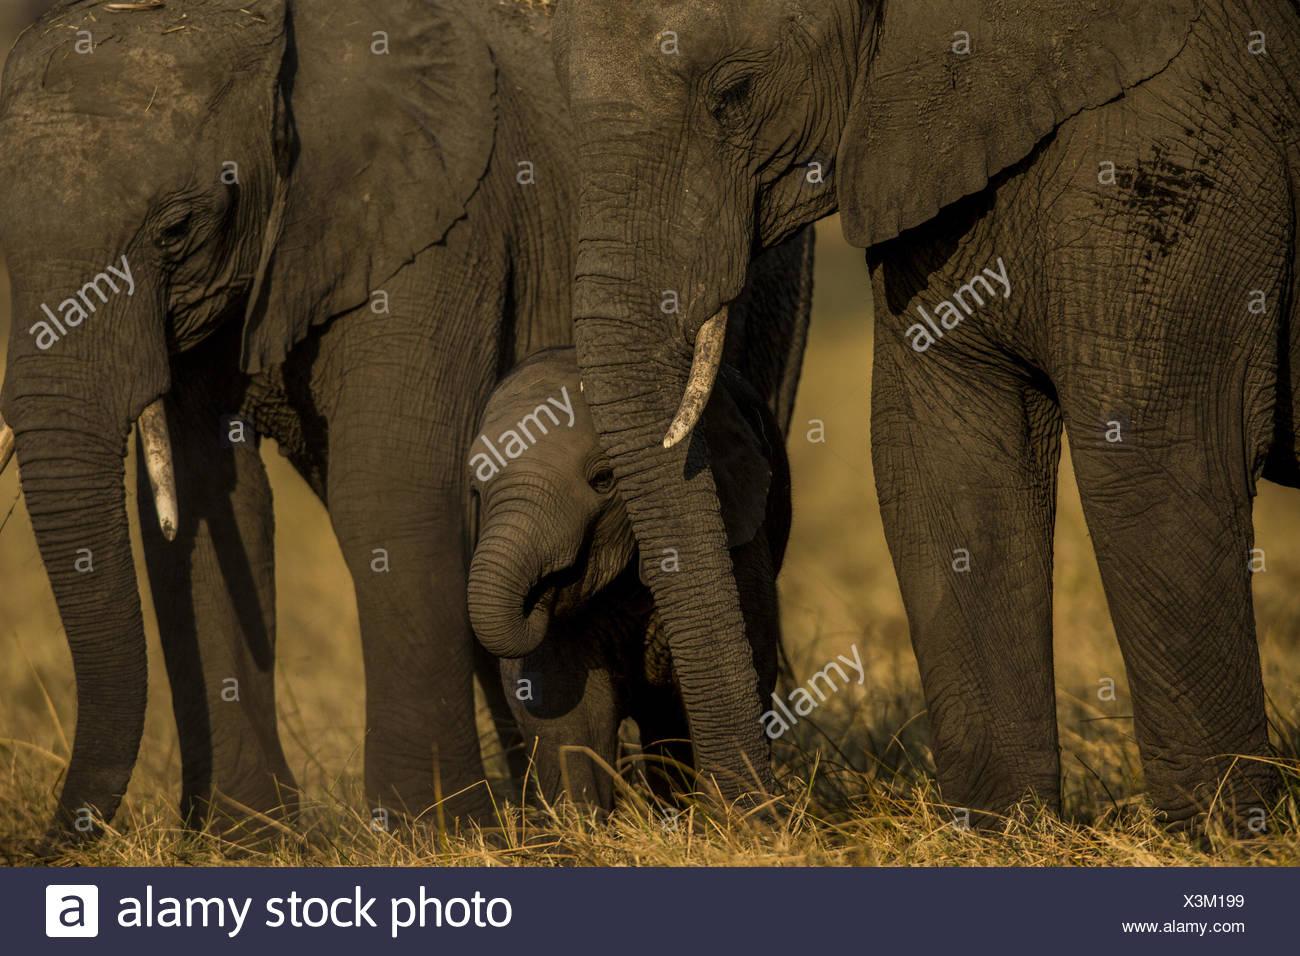 An elephant calf, Loxodonta africana, standing between adult elephants as they graze. - Stock Image